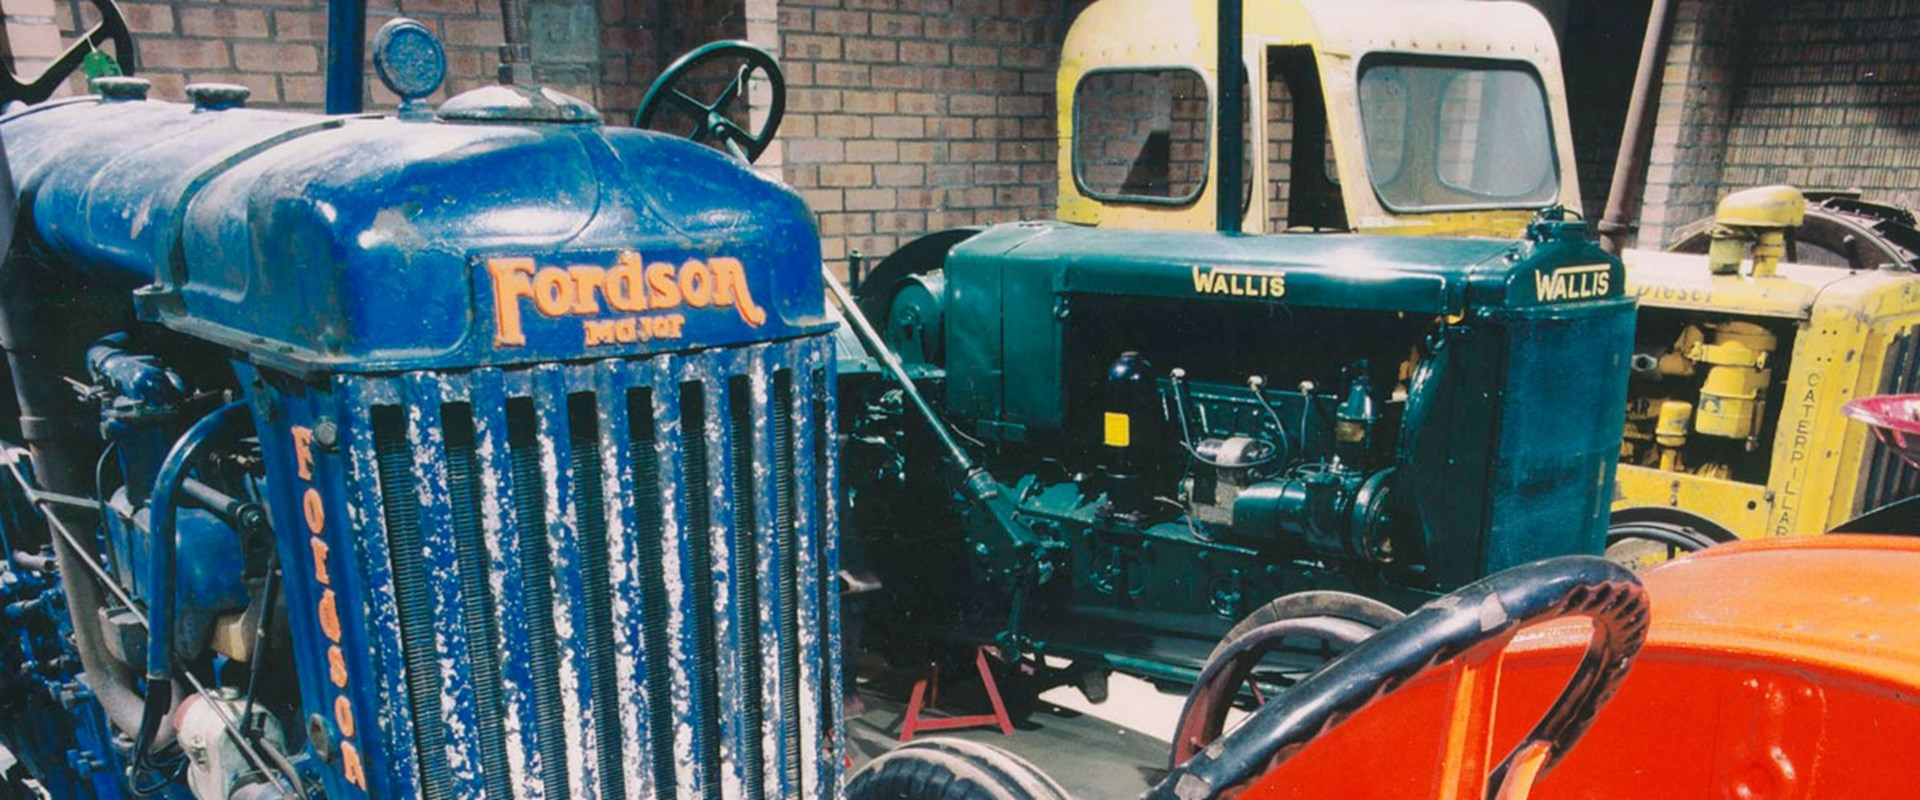 www nms ac uk/media/95759/tractors jpg?center=0 50